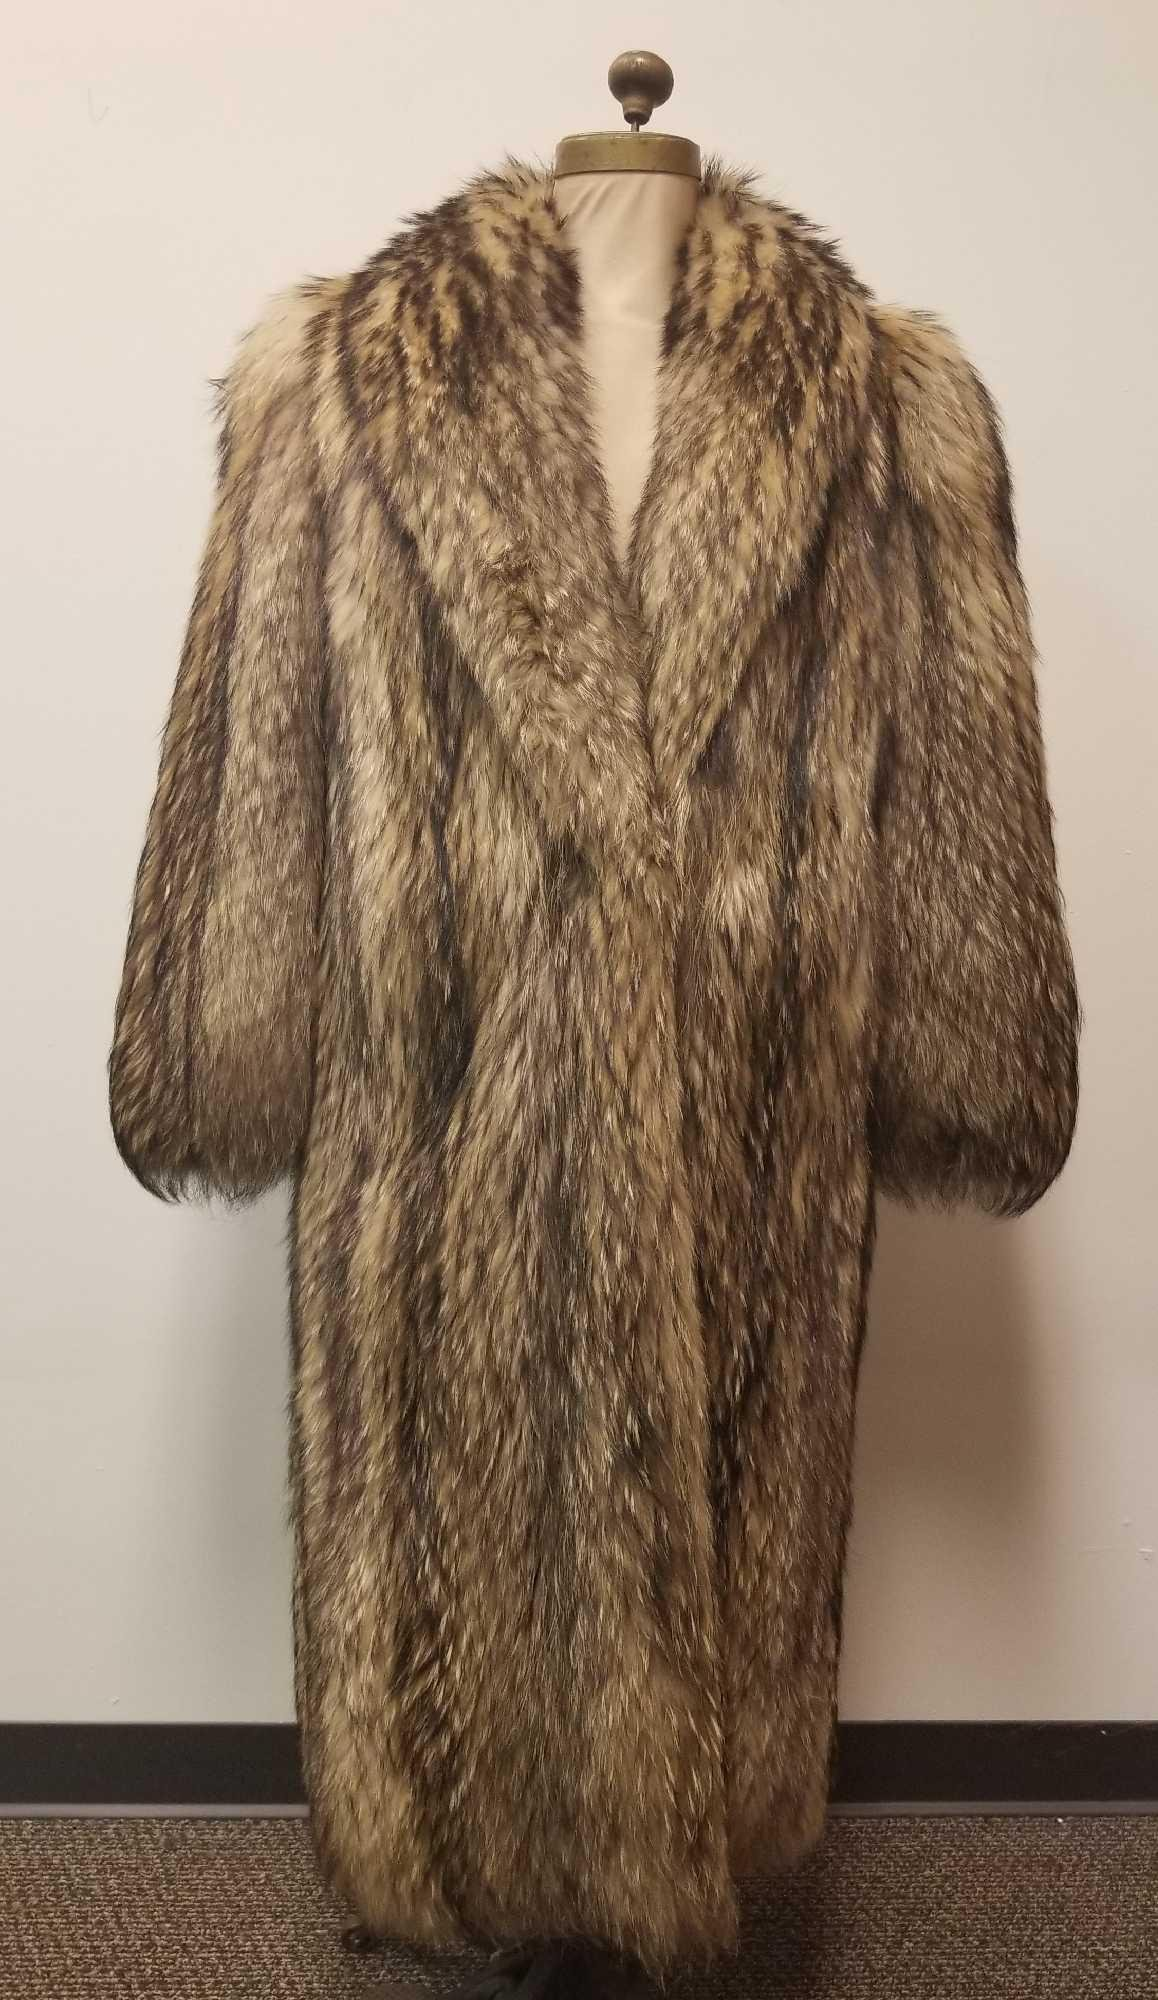 Full Length Tanuki Japanese Fur Coat by Frederick and